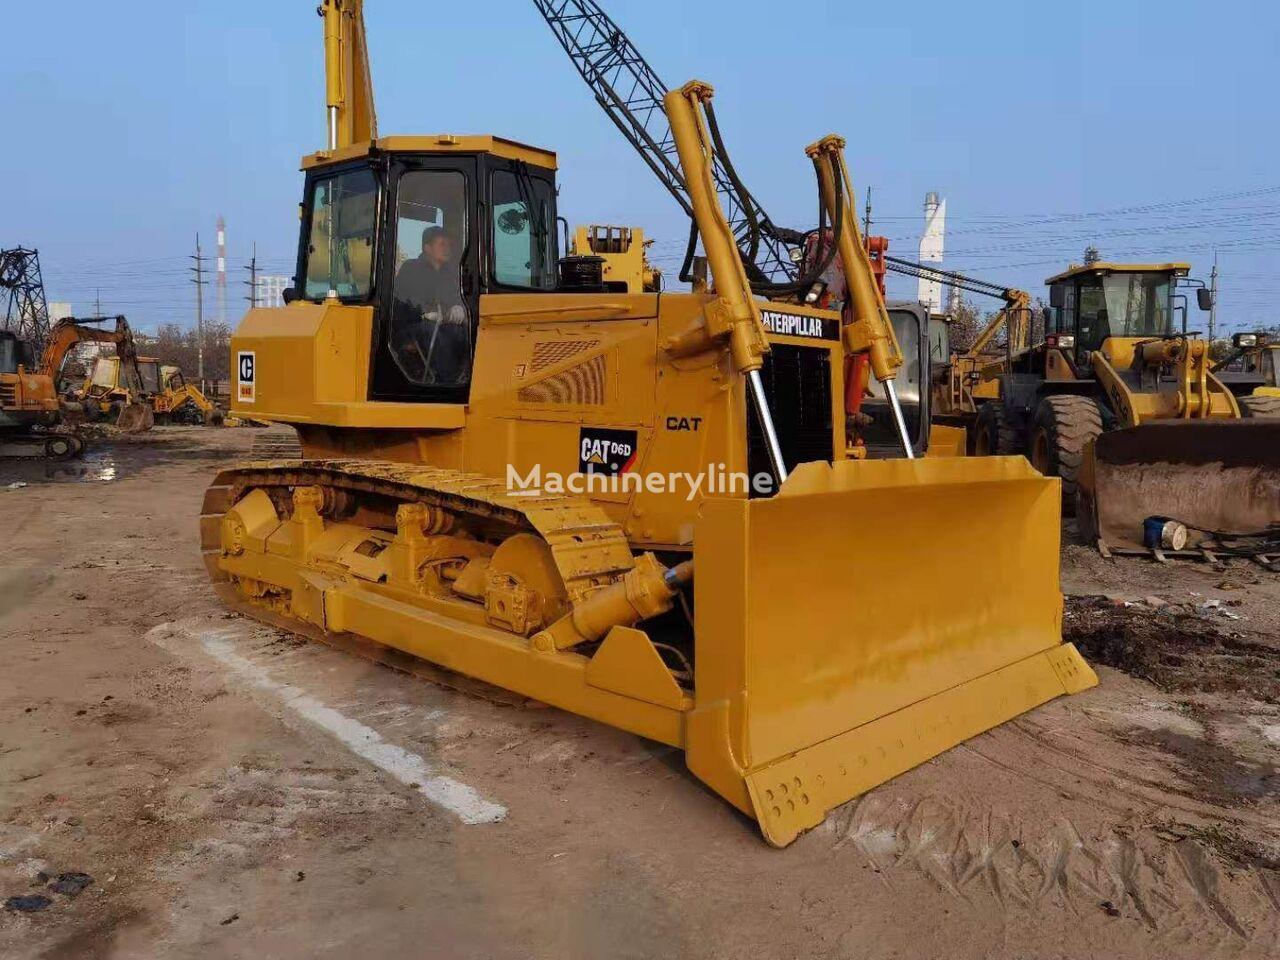 CATERPILLAR D6D bulldozer